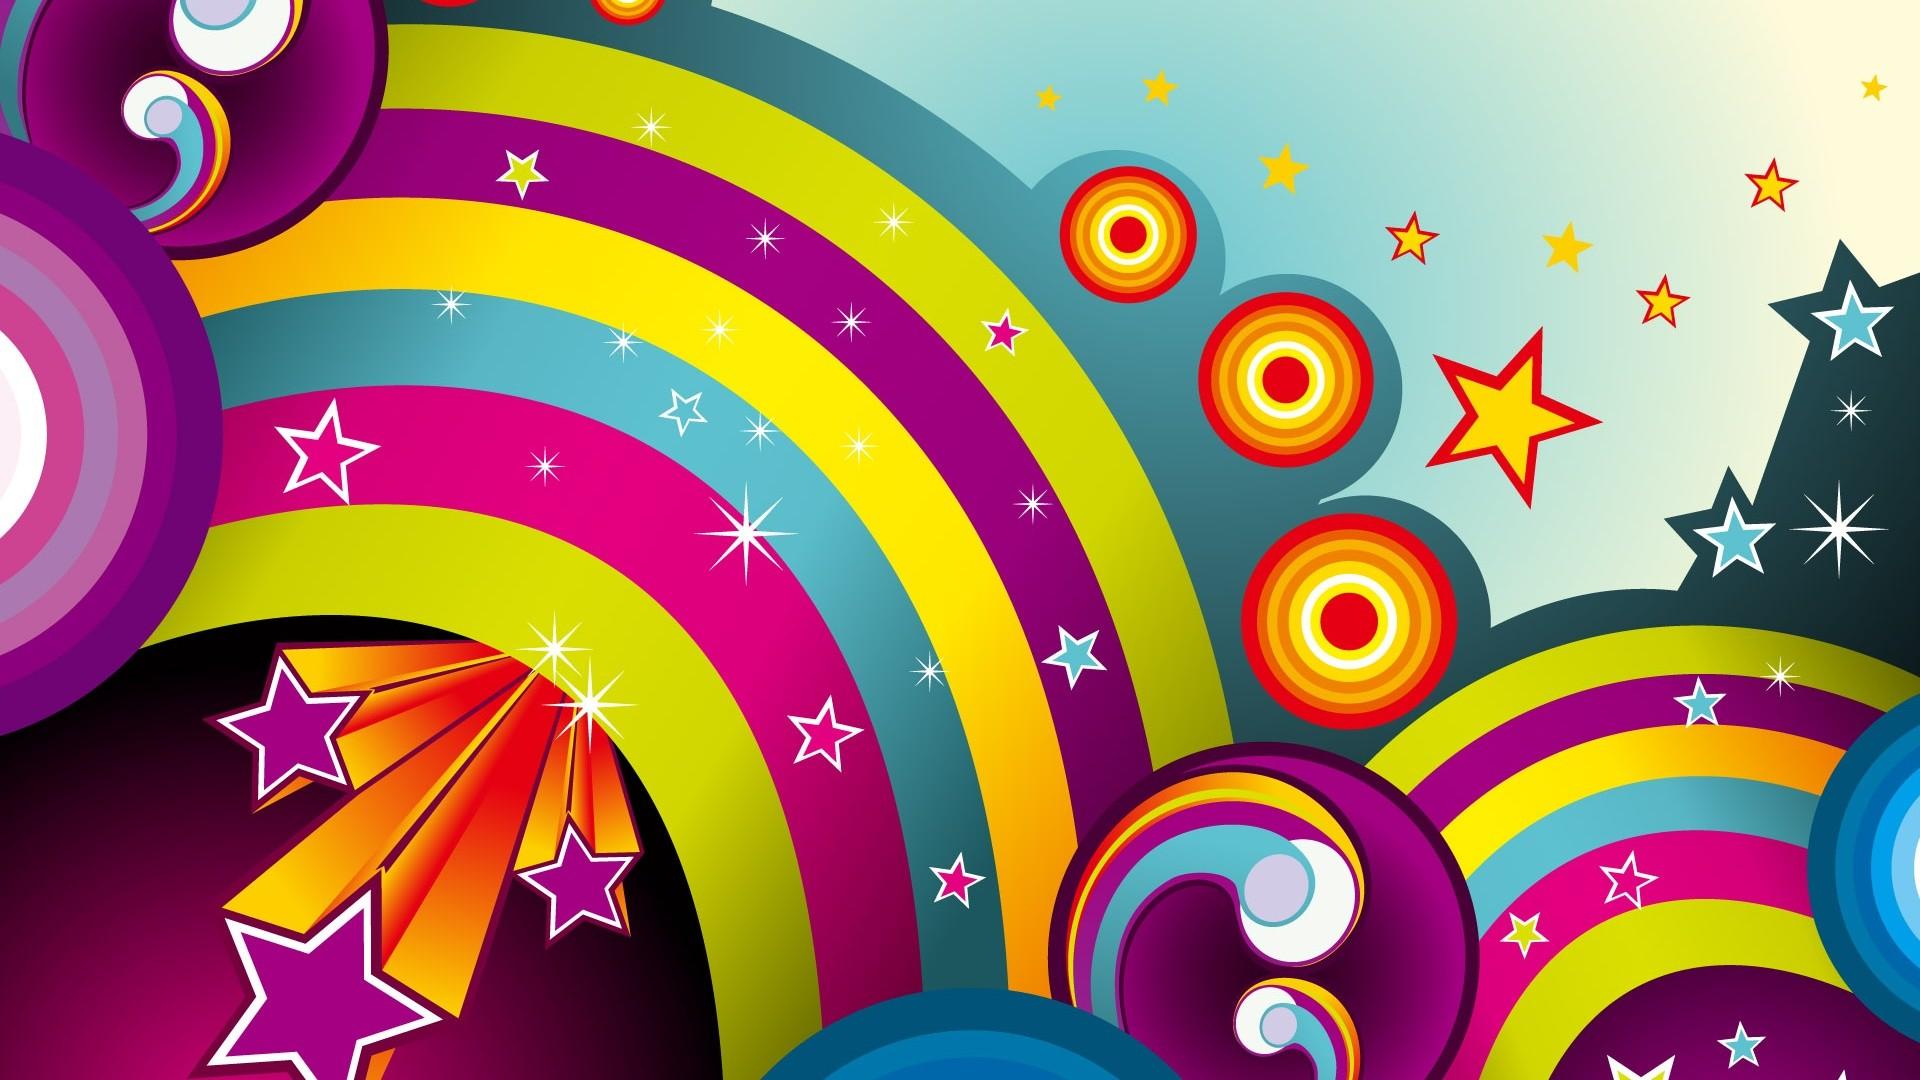 Colorful Wallpaper Designs 1